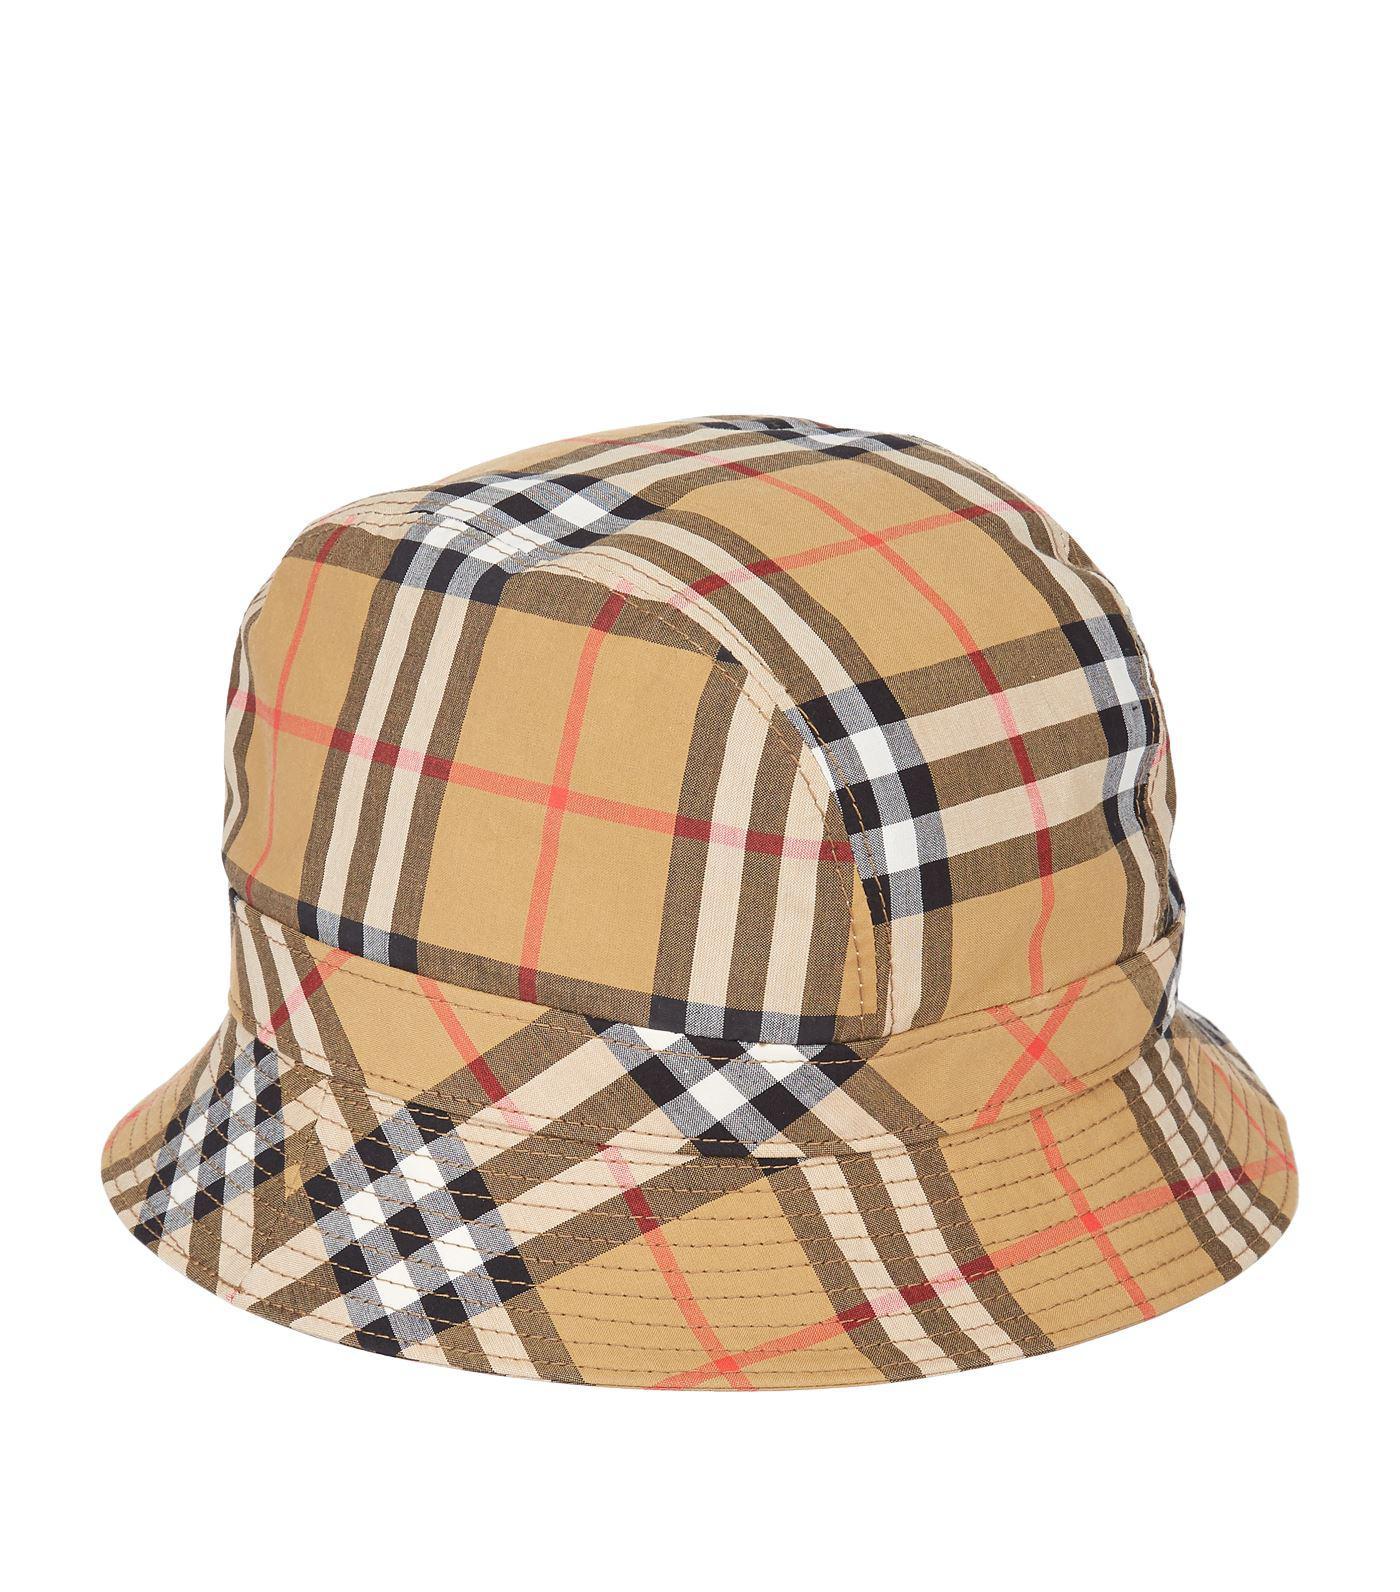 ab972879de3ebc Tap to visit site. Burberry - Yellow Vintage Check Bucket Hat ...